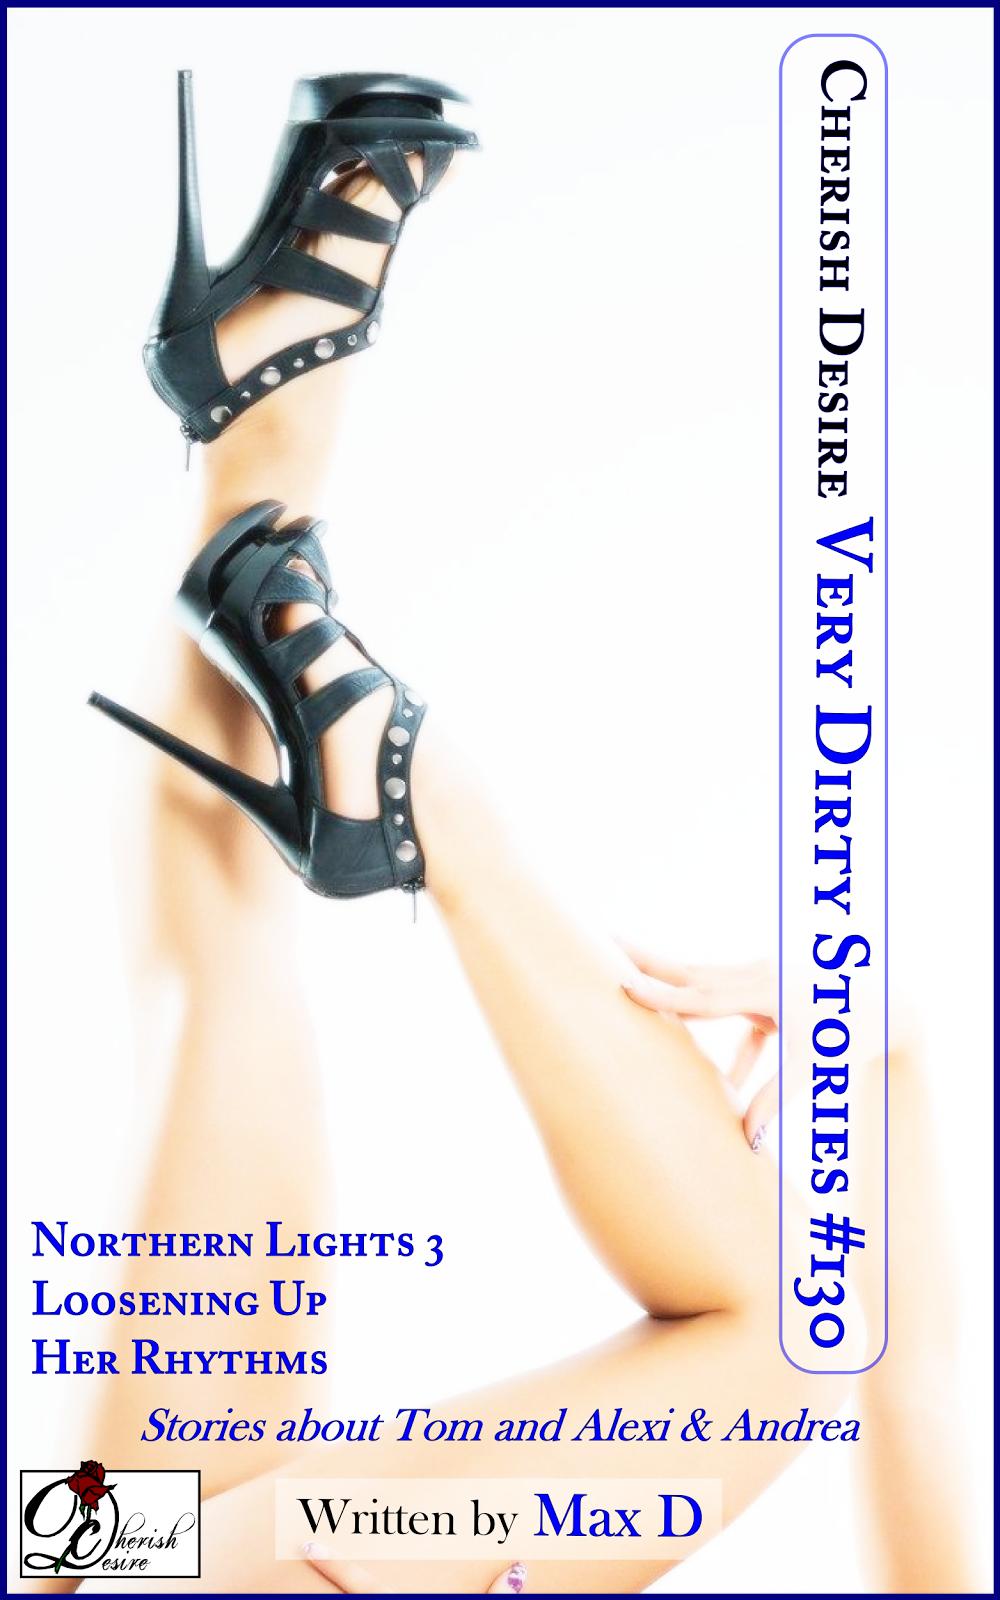 Cherish Desire: Very Dirty Stories #130, Max D, erotica